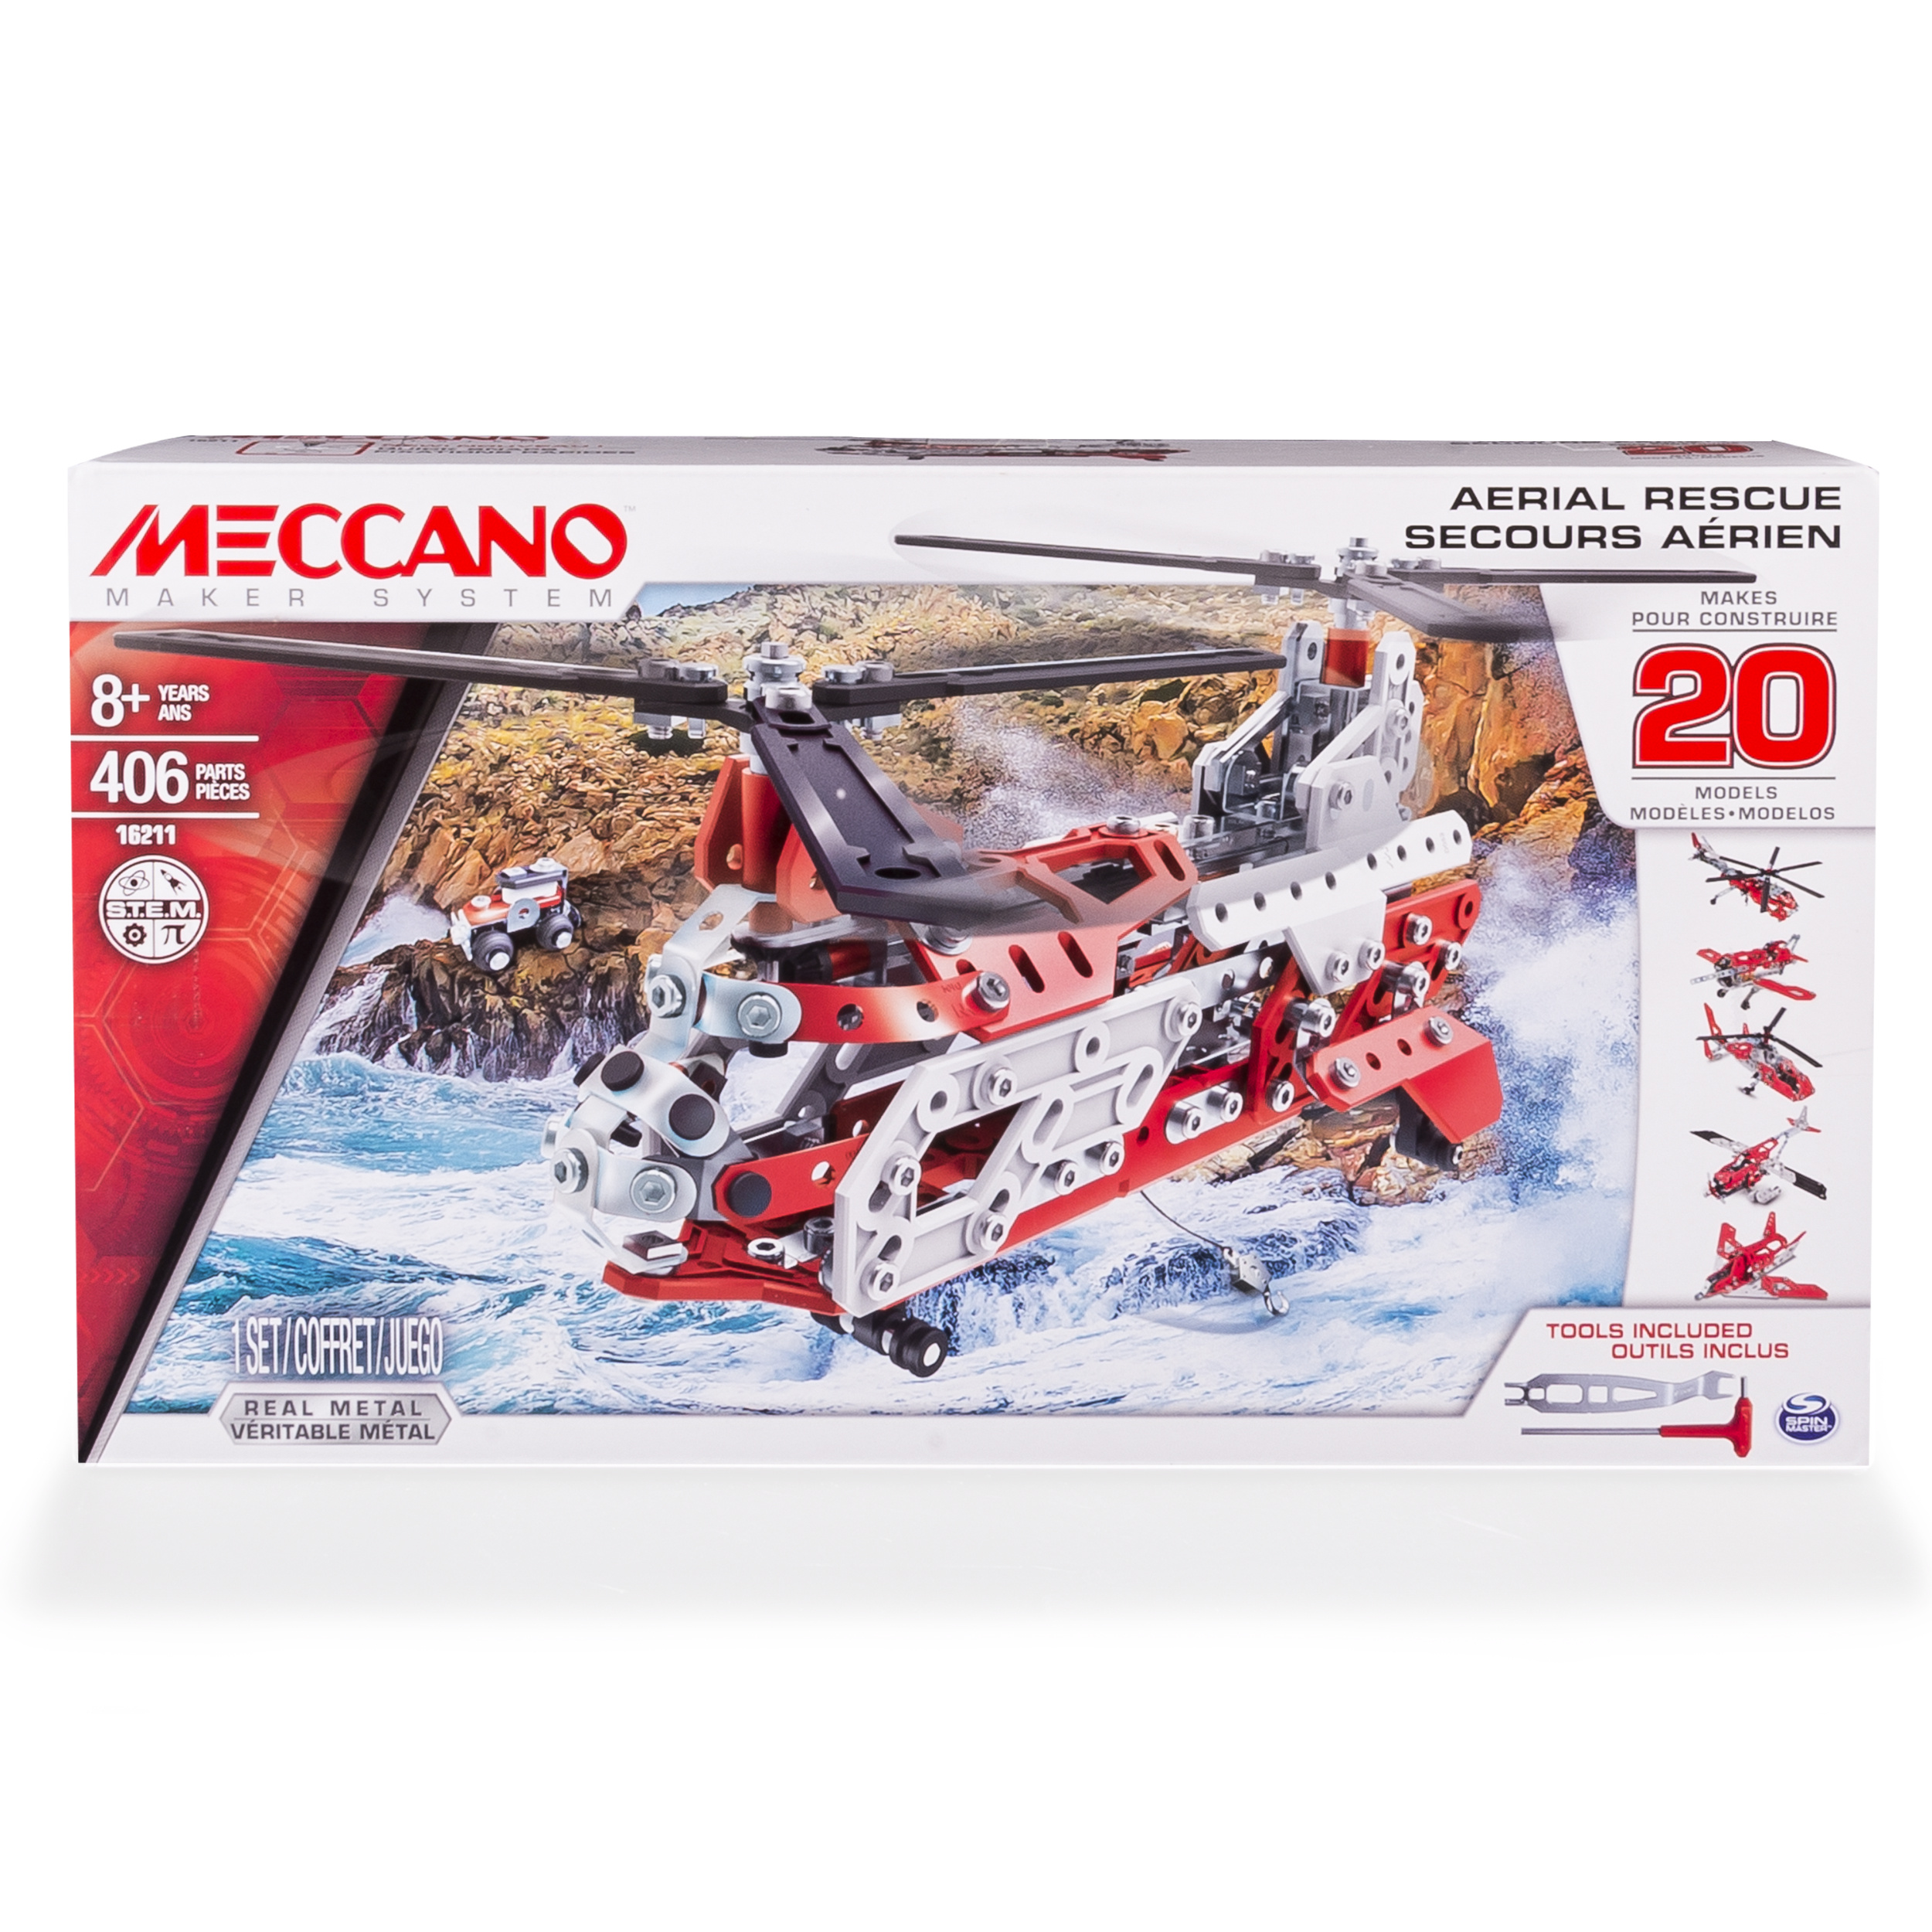 Meccano - 20 Models Set - Aerial Rescue